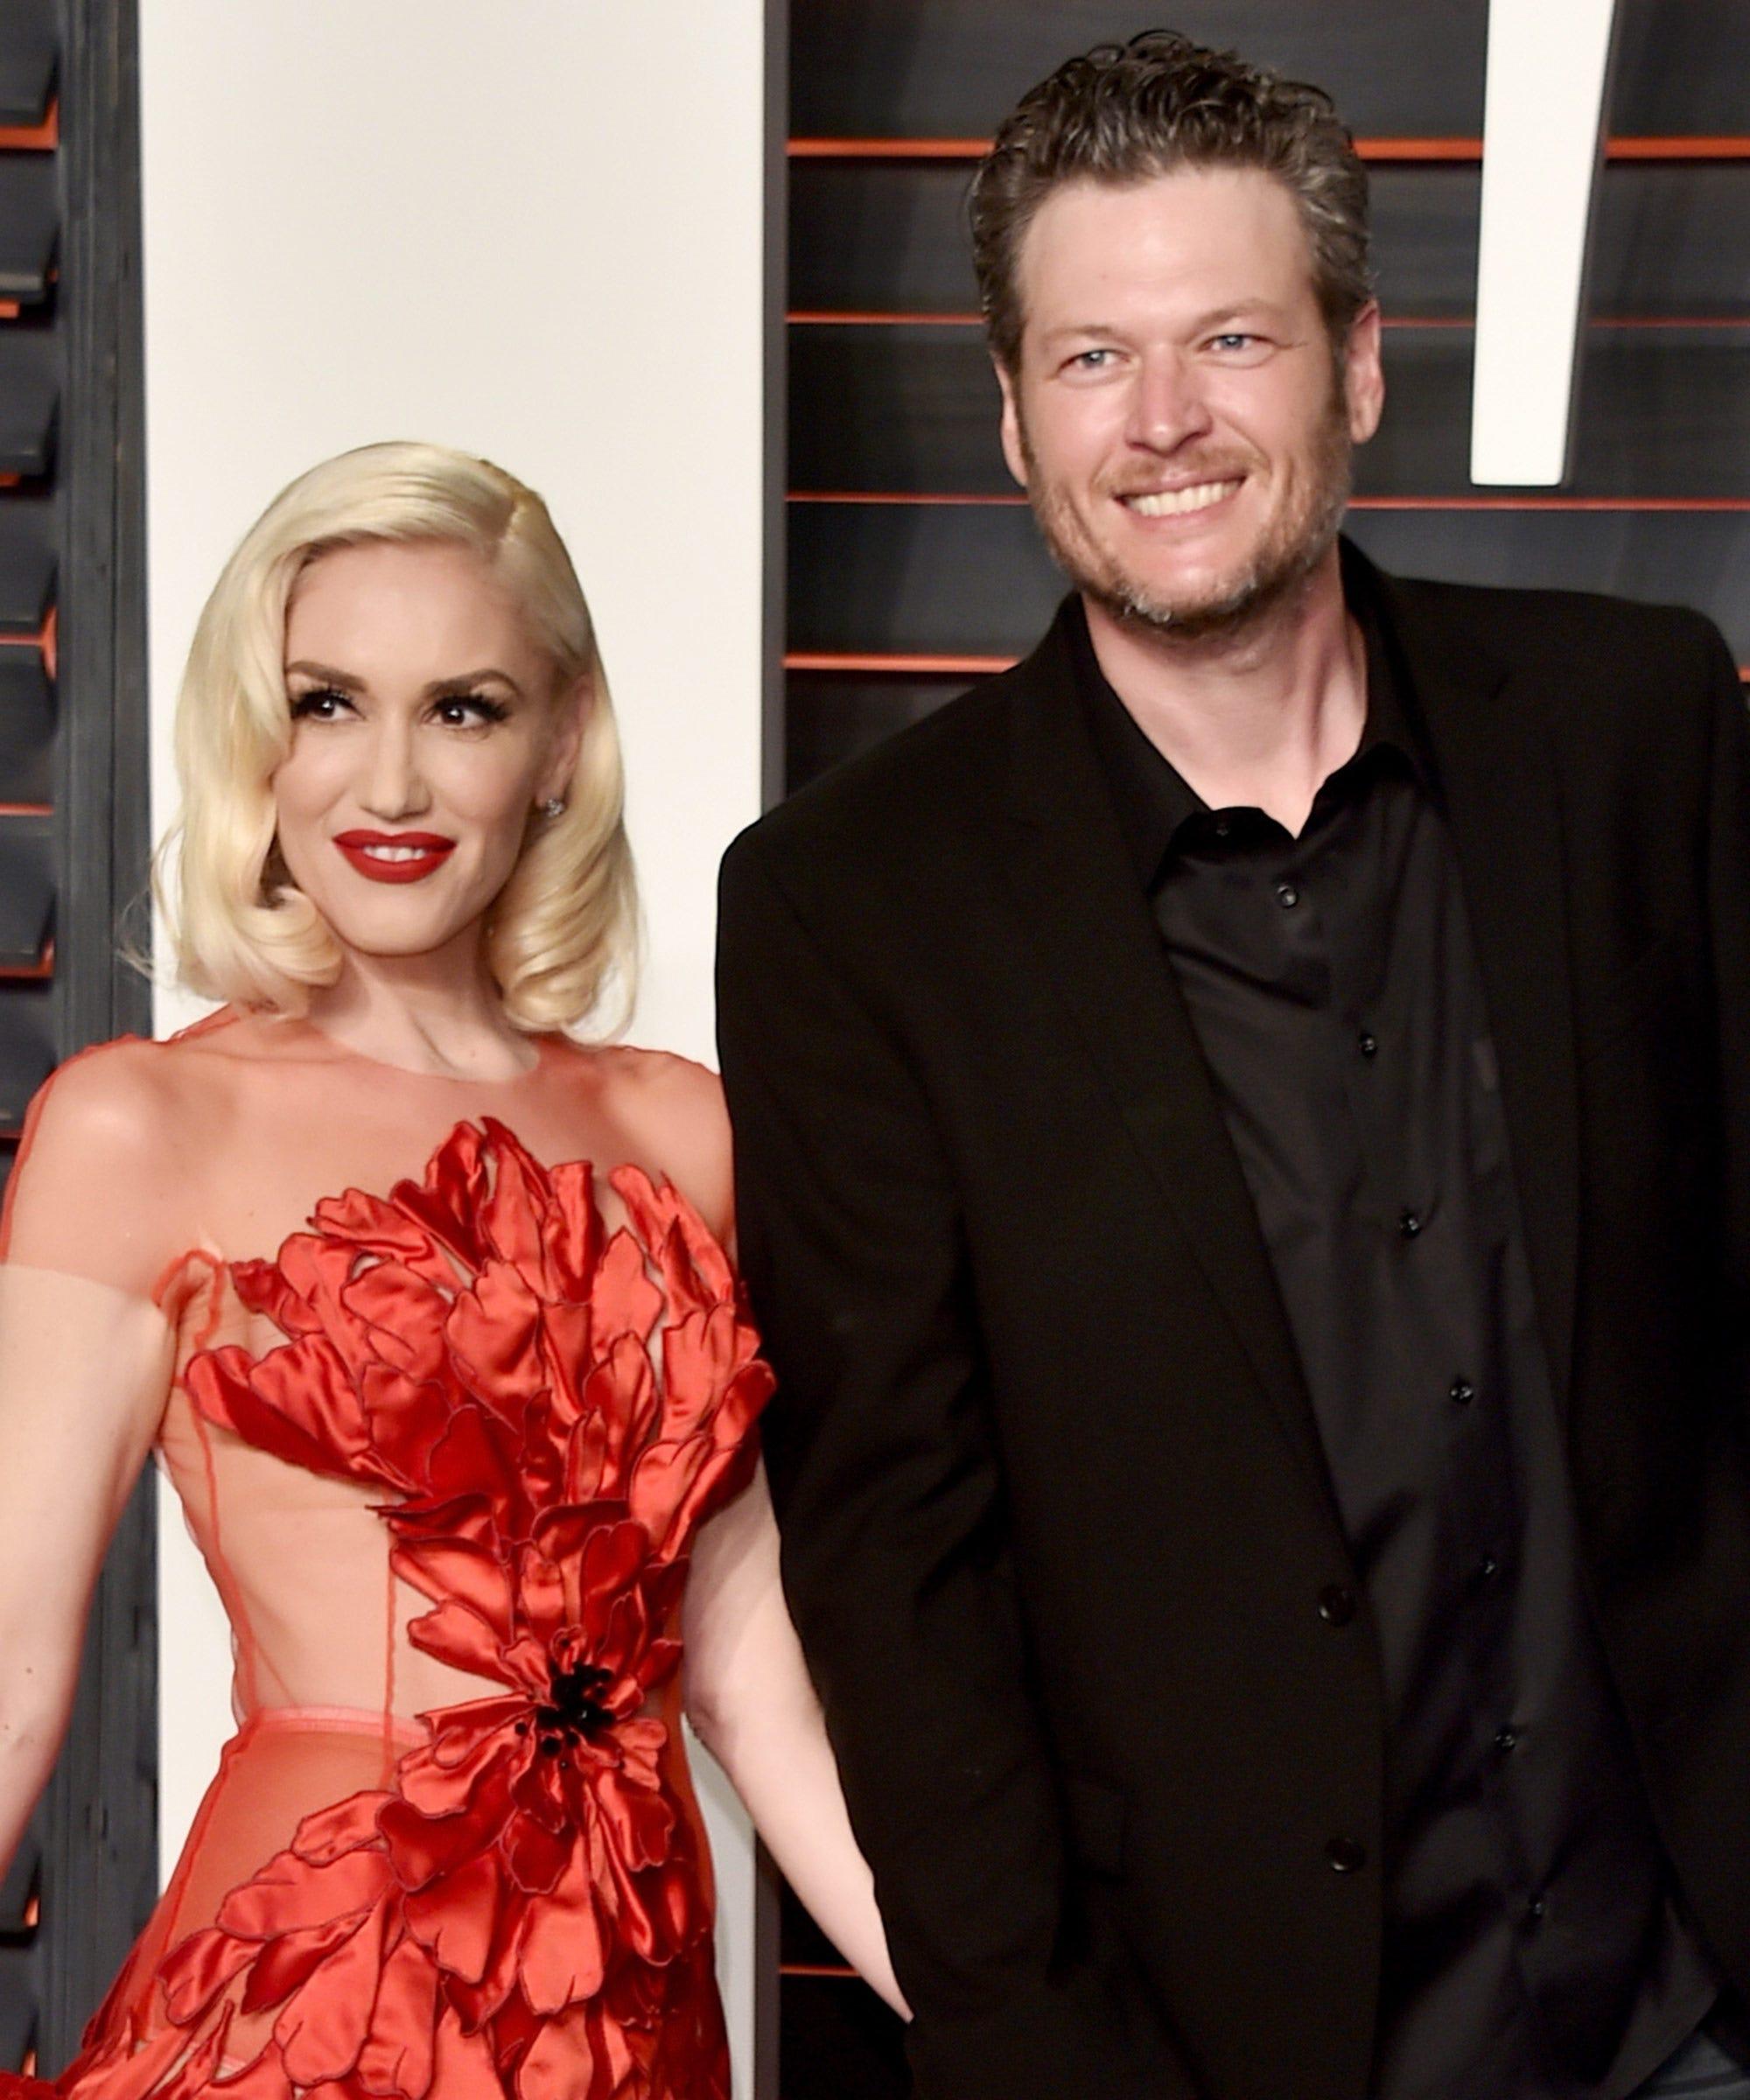 Gwen Stefani Blake Shelton Christmas Song, The Voice